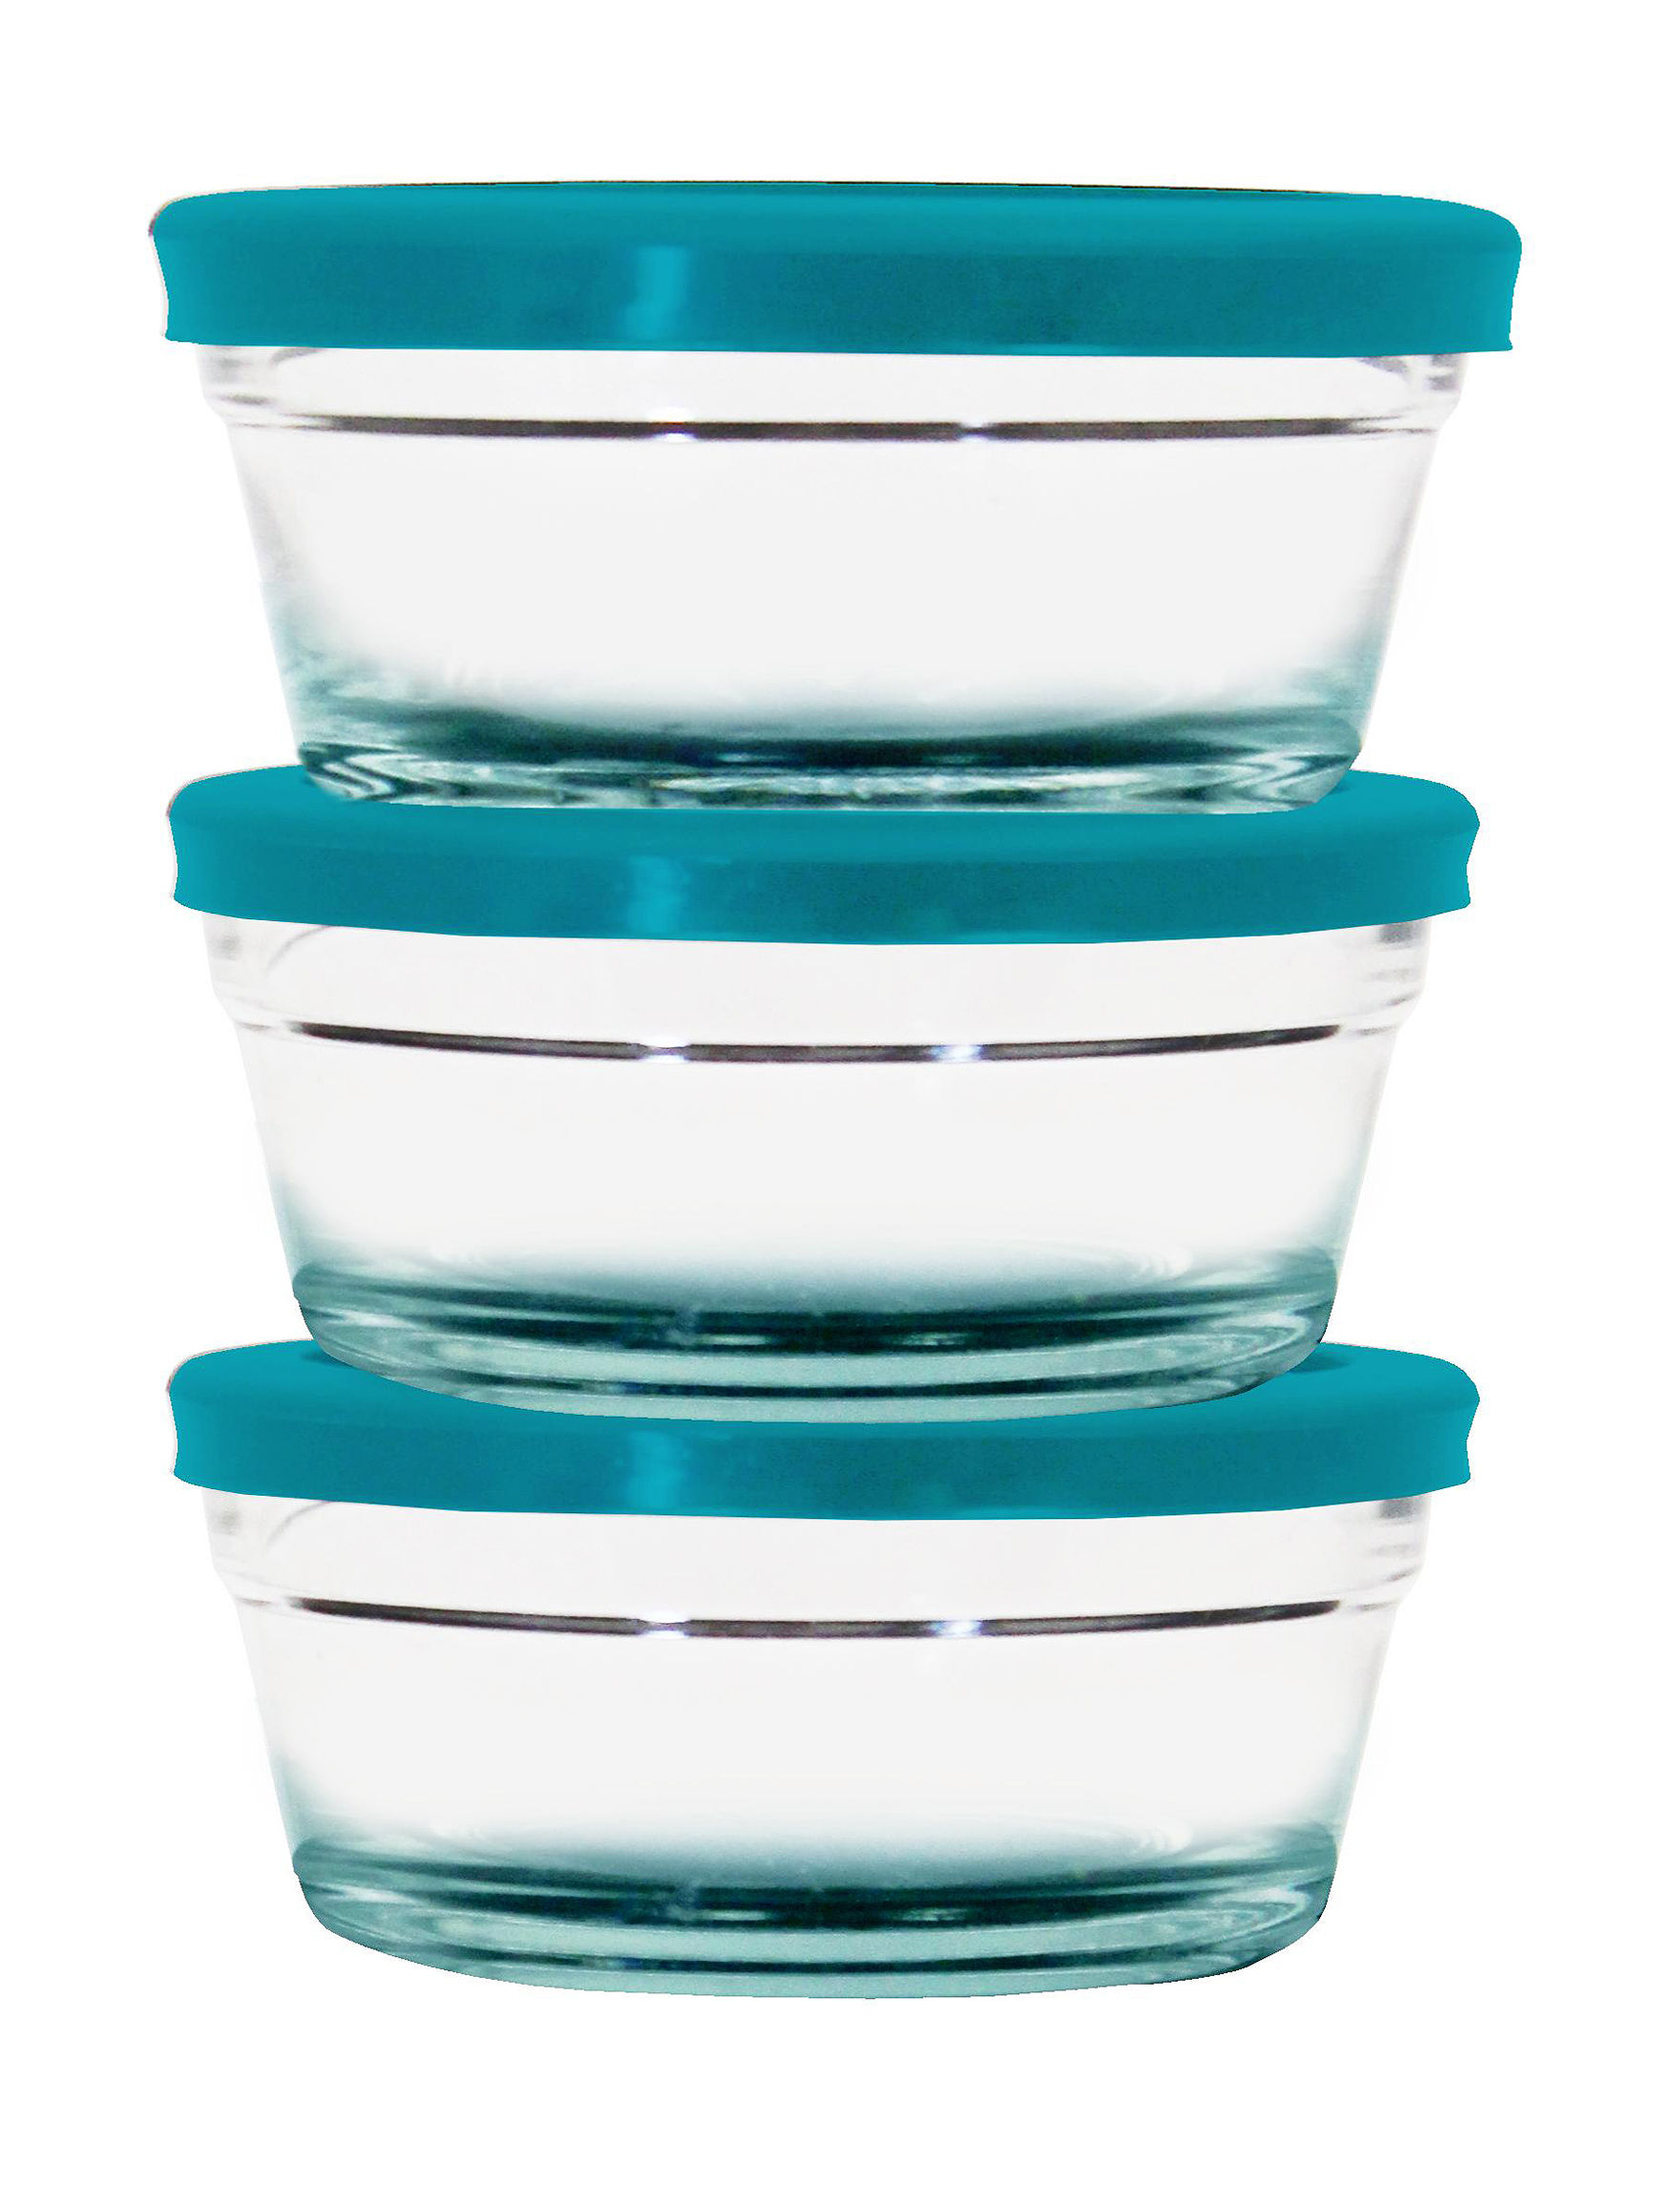 Farberware Turquoise Bowls Food Storage Kitchen Storage & Organization